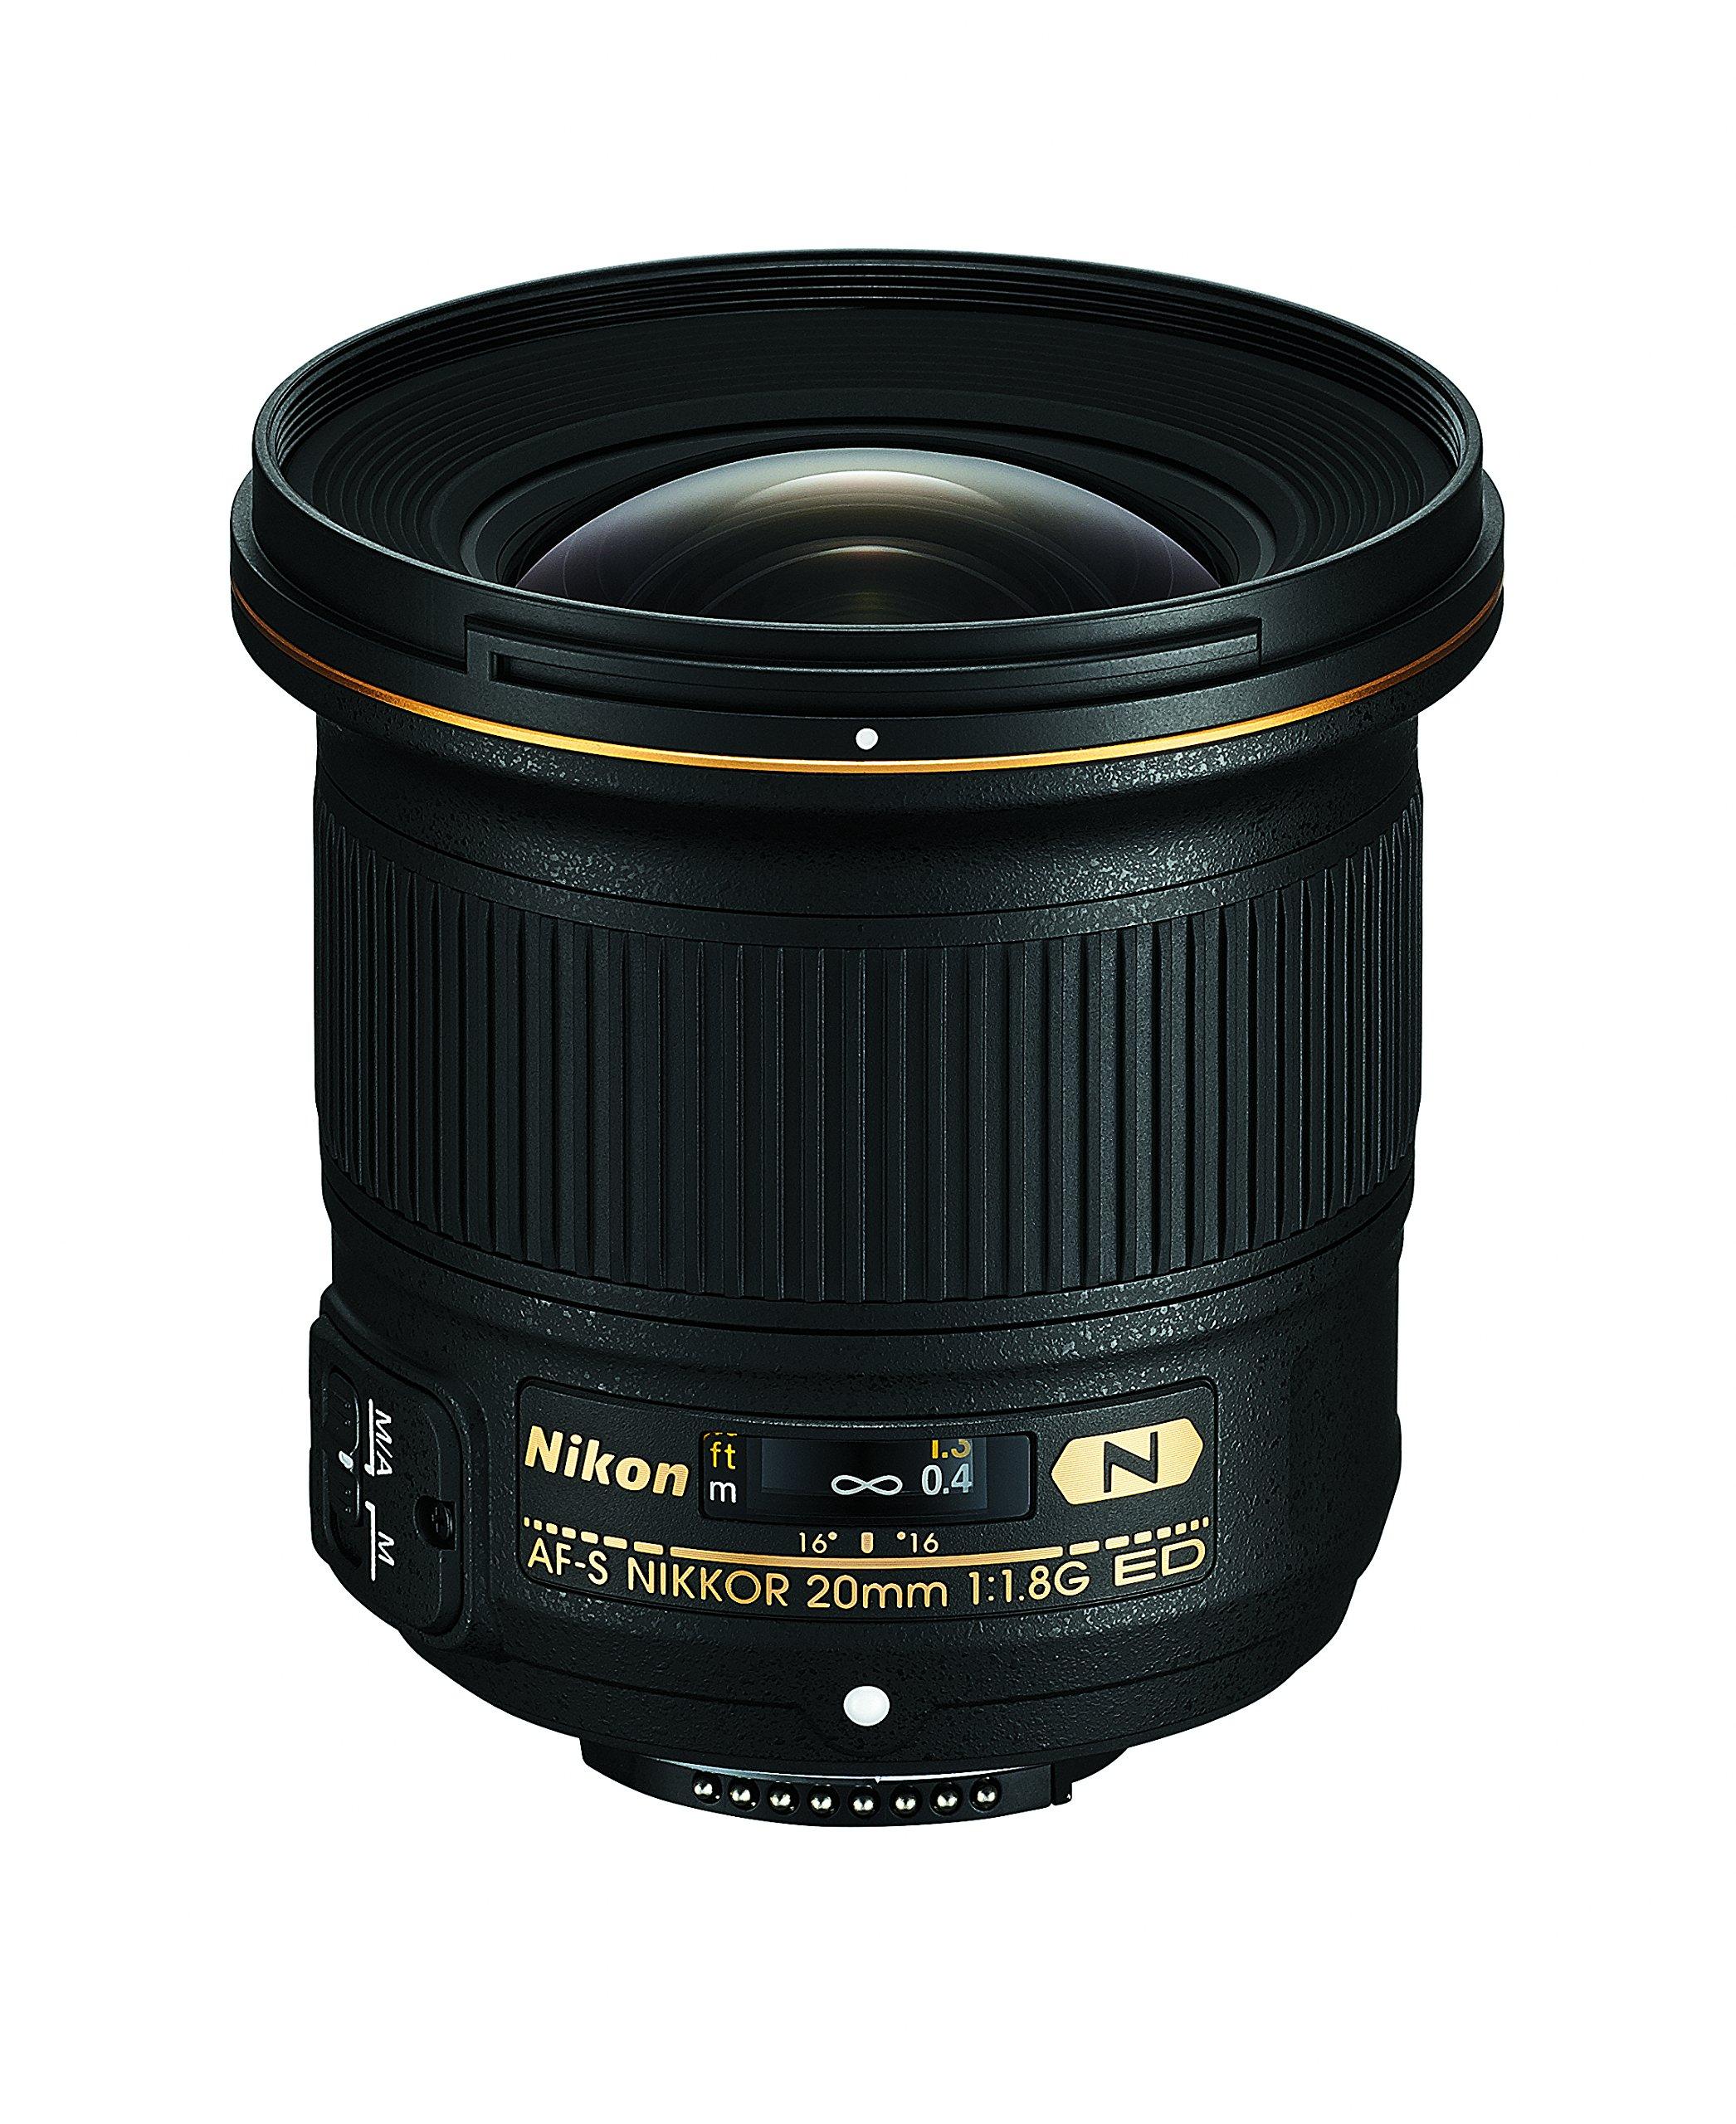 Nikon AF-S FX NIKKOR 20mm f/1.8G ED Fixed Lens with Auto Focus for Nikon DSLR Cameras by Nikon